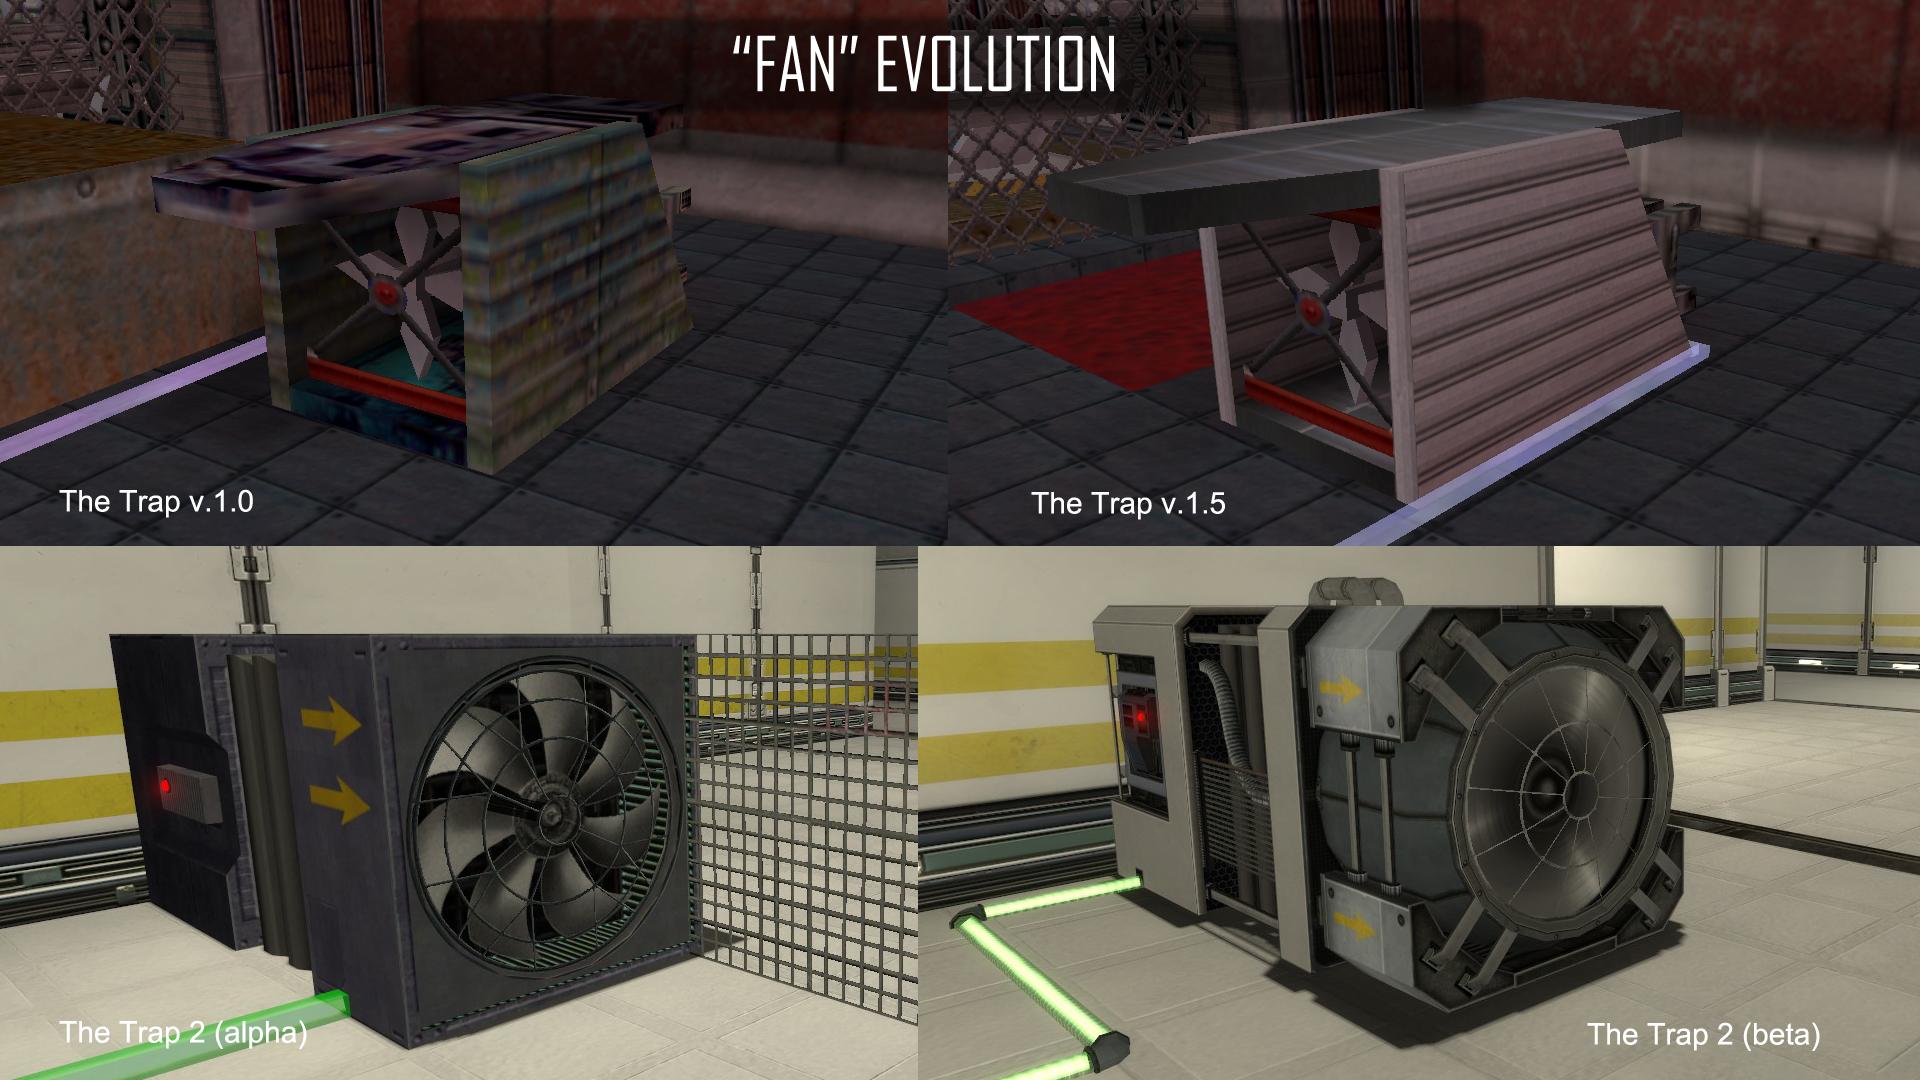 thetrap2 mindlock evolution 01 f